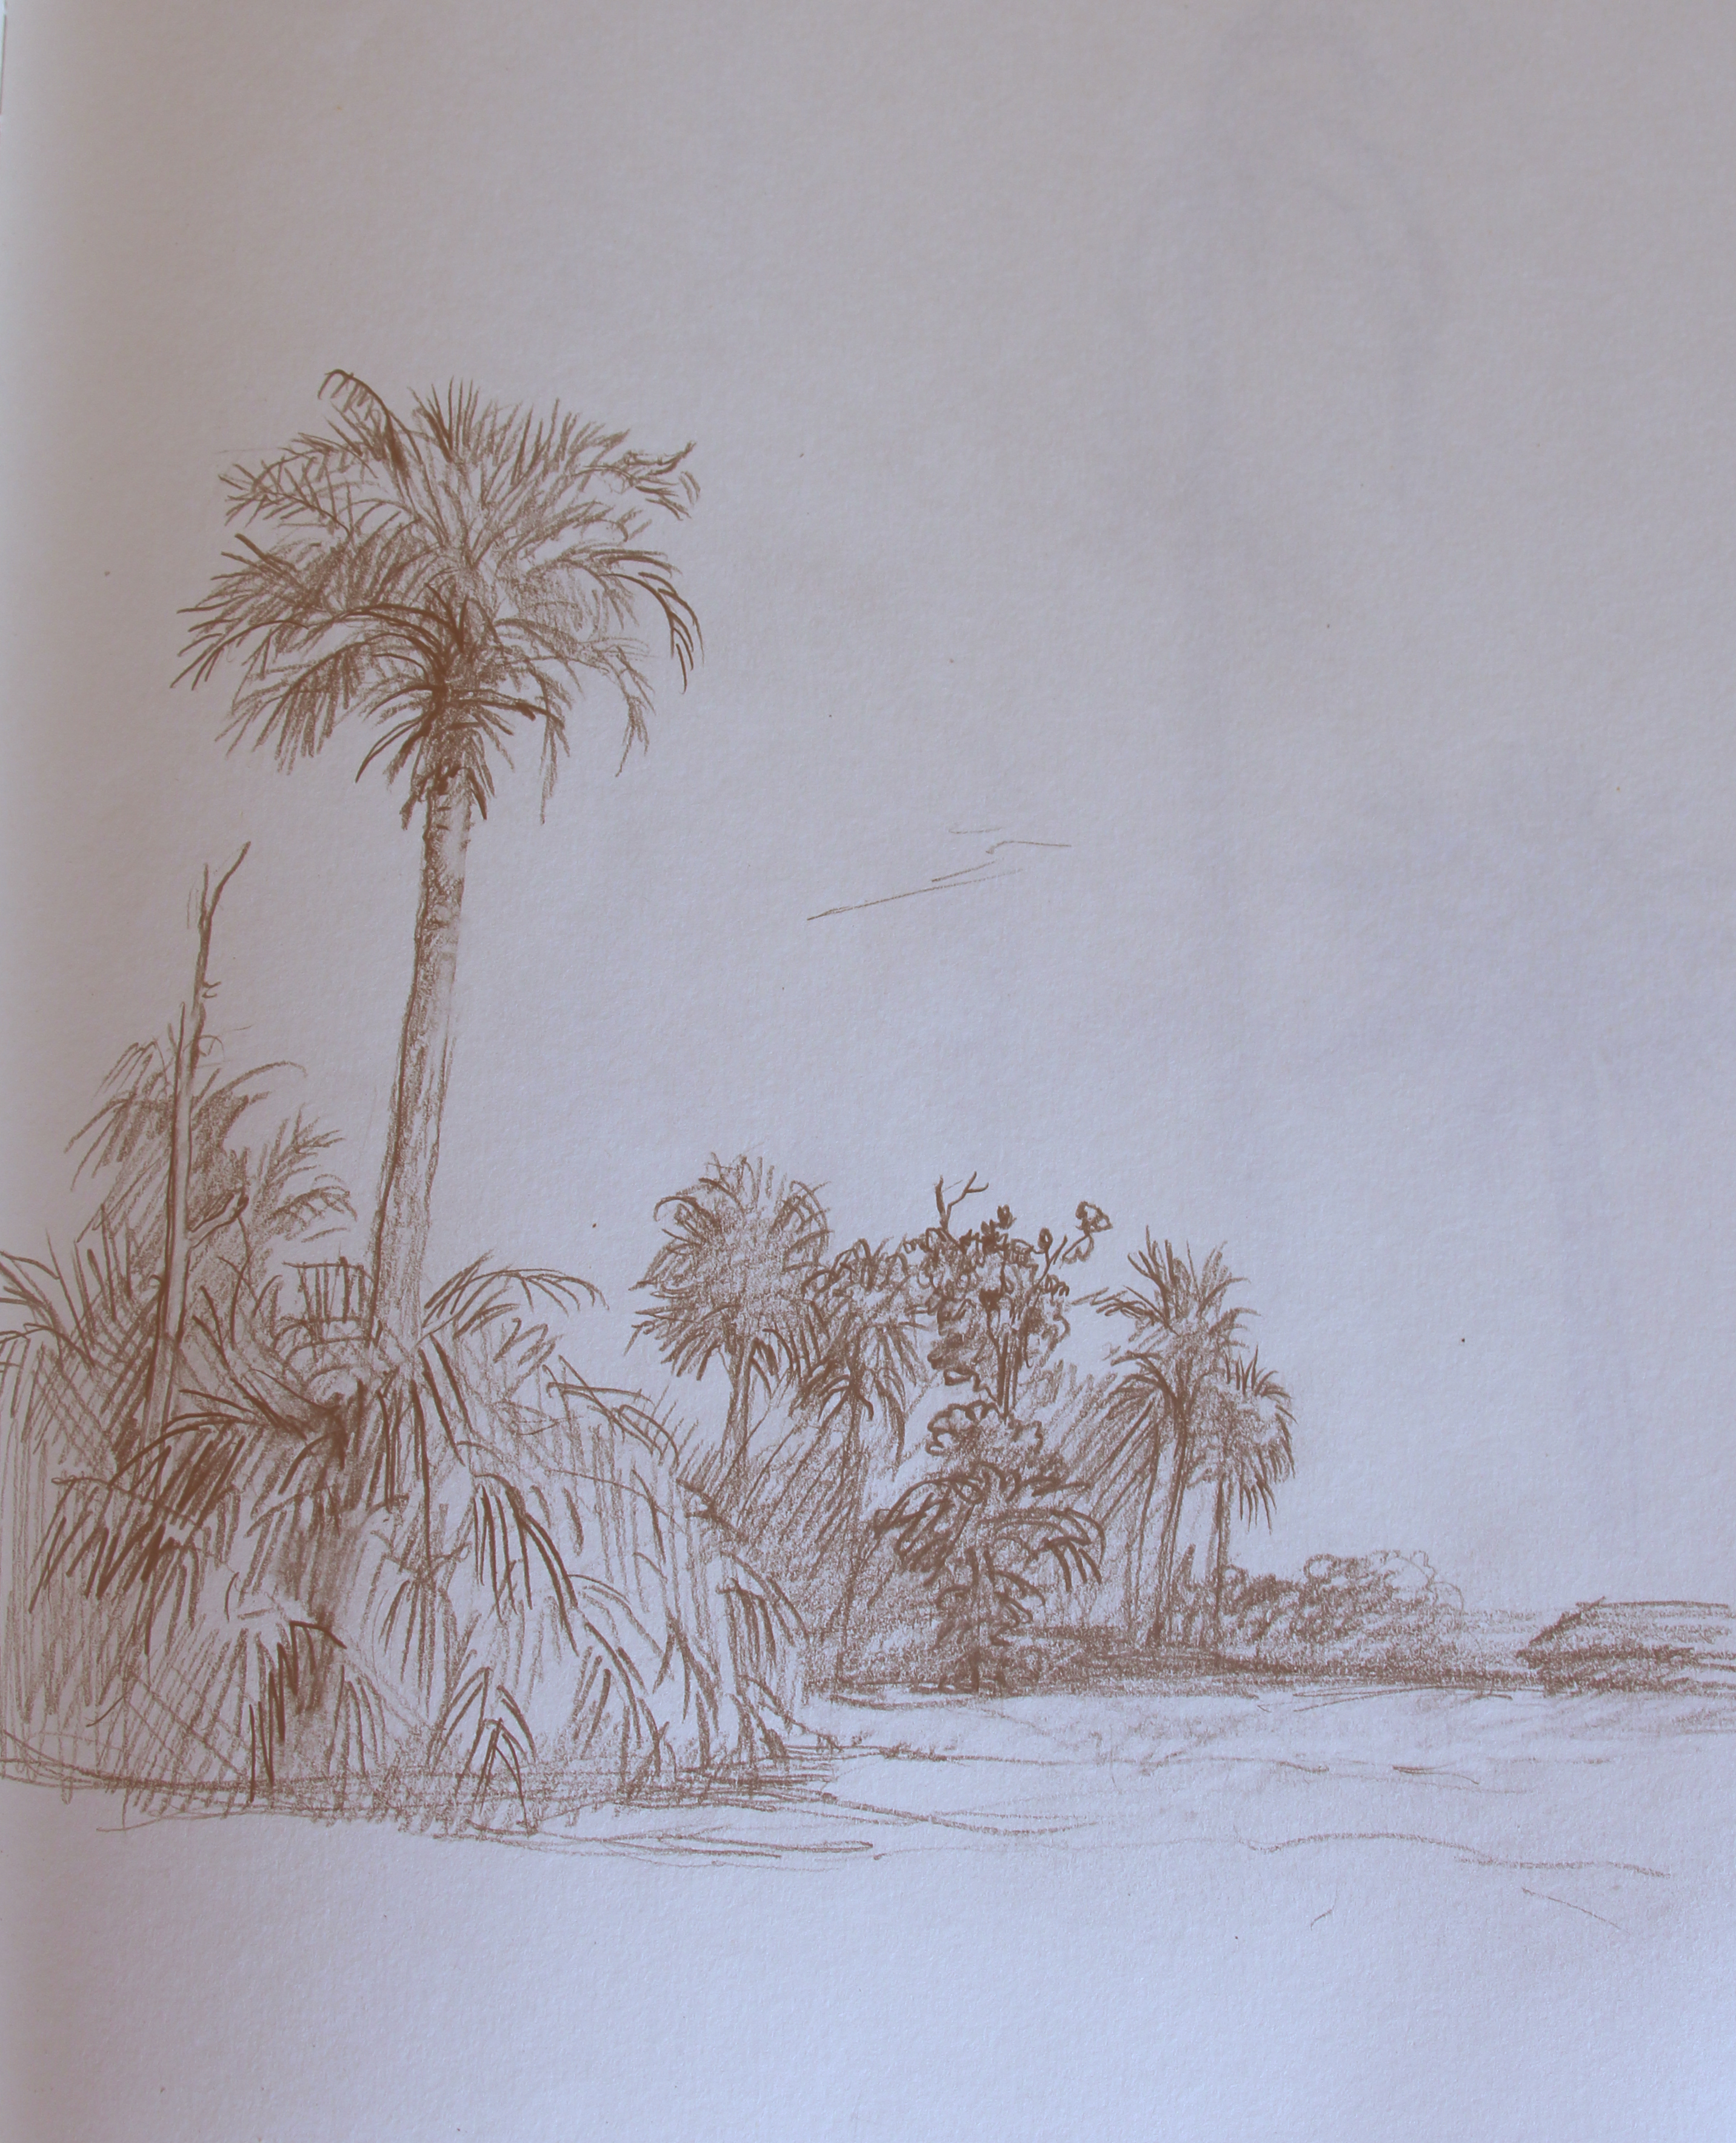 Drawn palm tree lanscape #7